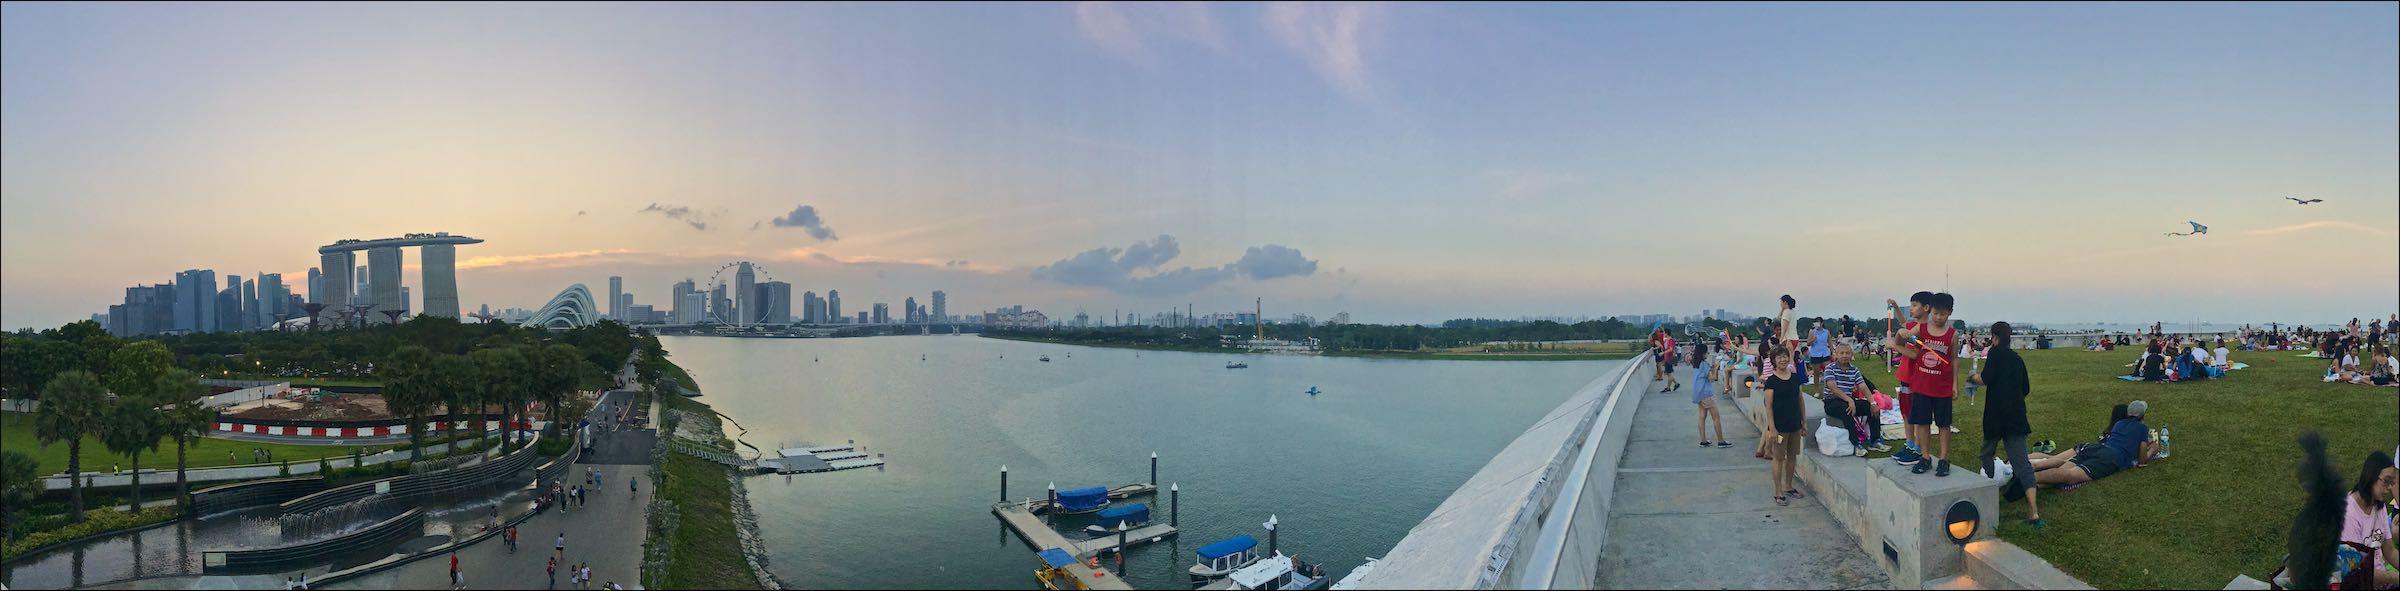 Panorama from Marina Barrage